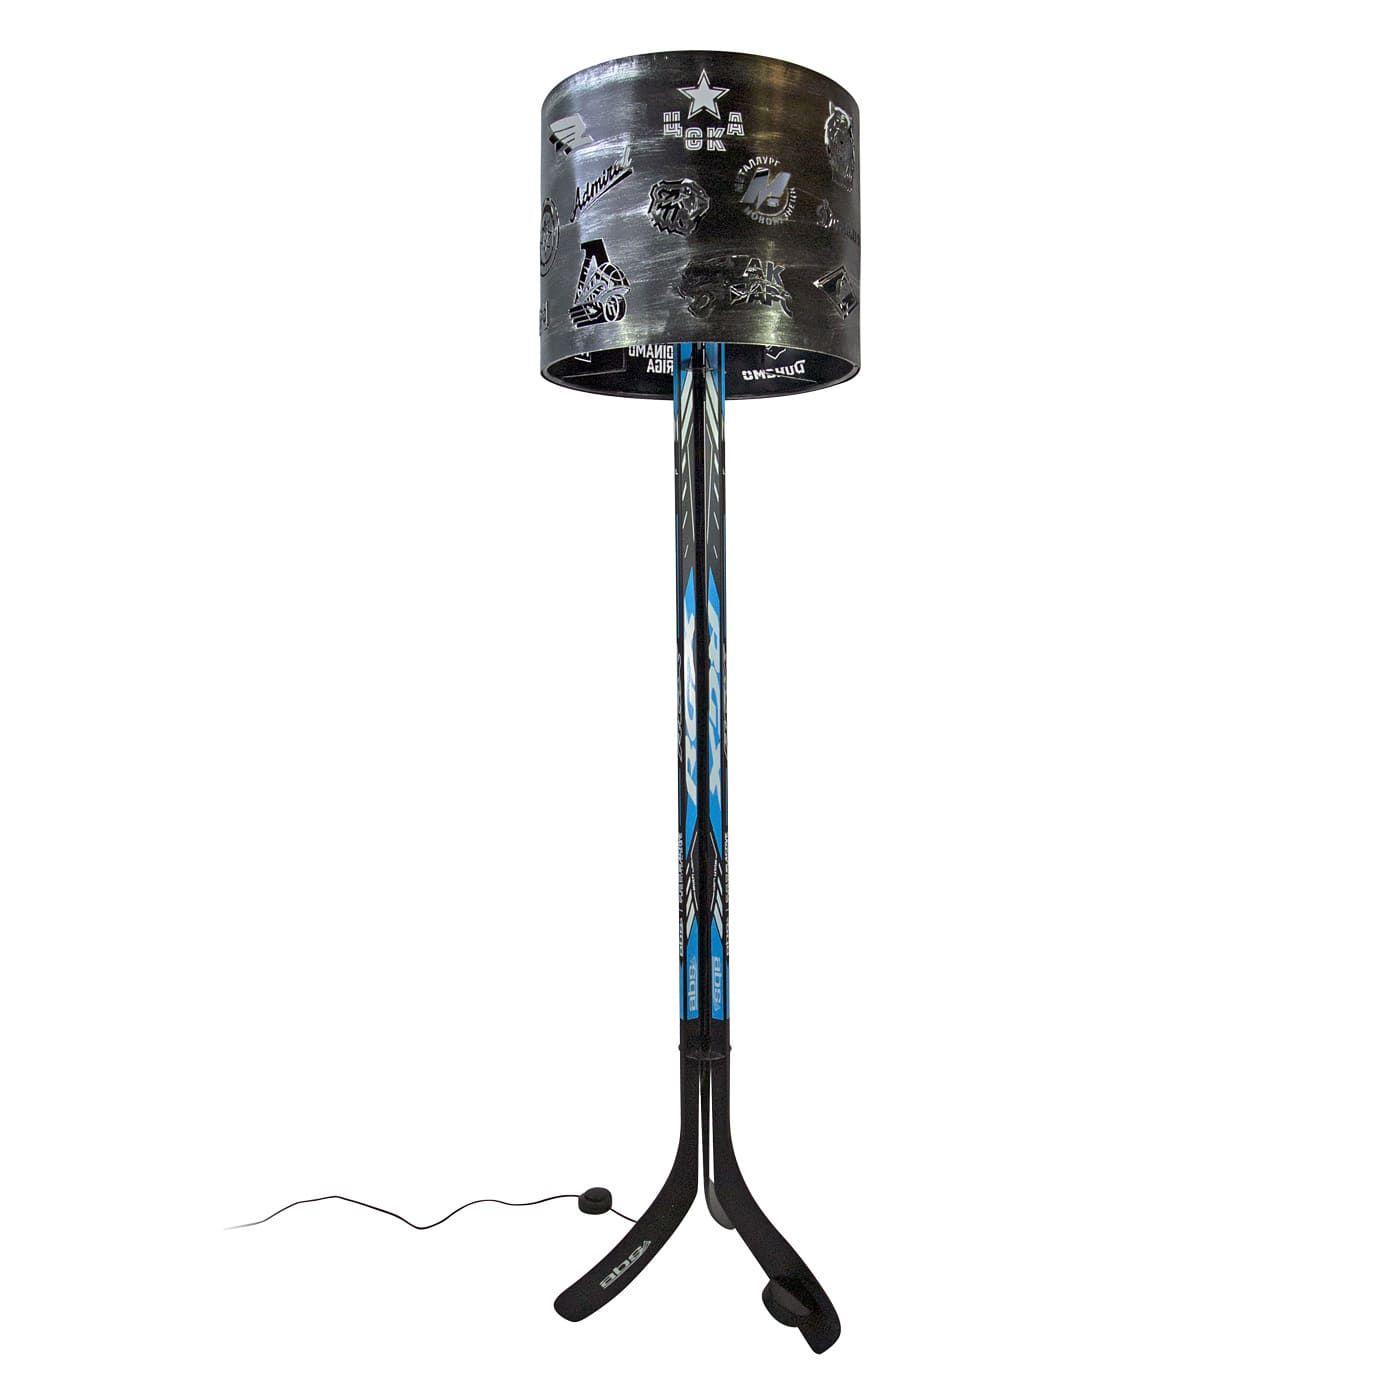 PETRASVET / Floor lamp S1157-3, 3xE14 max. 60W